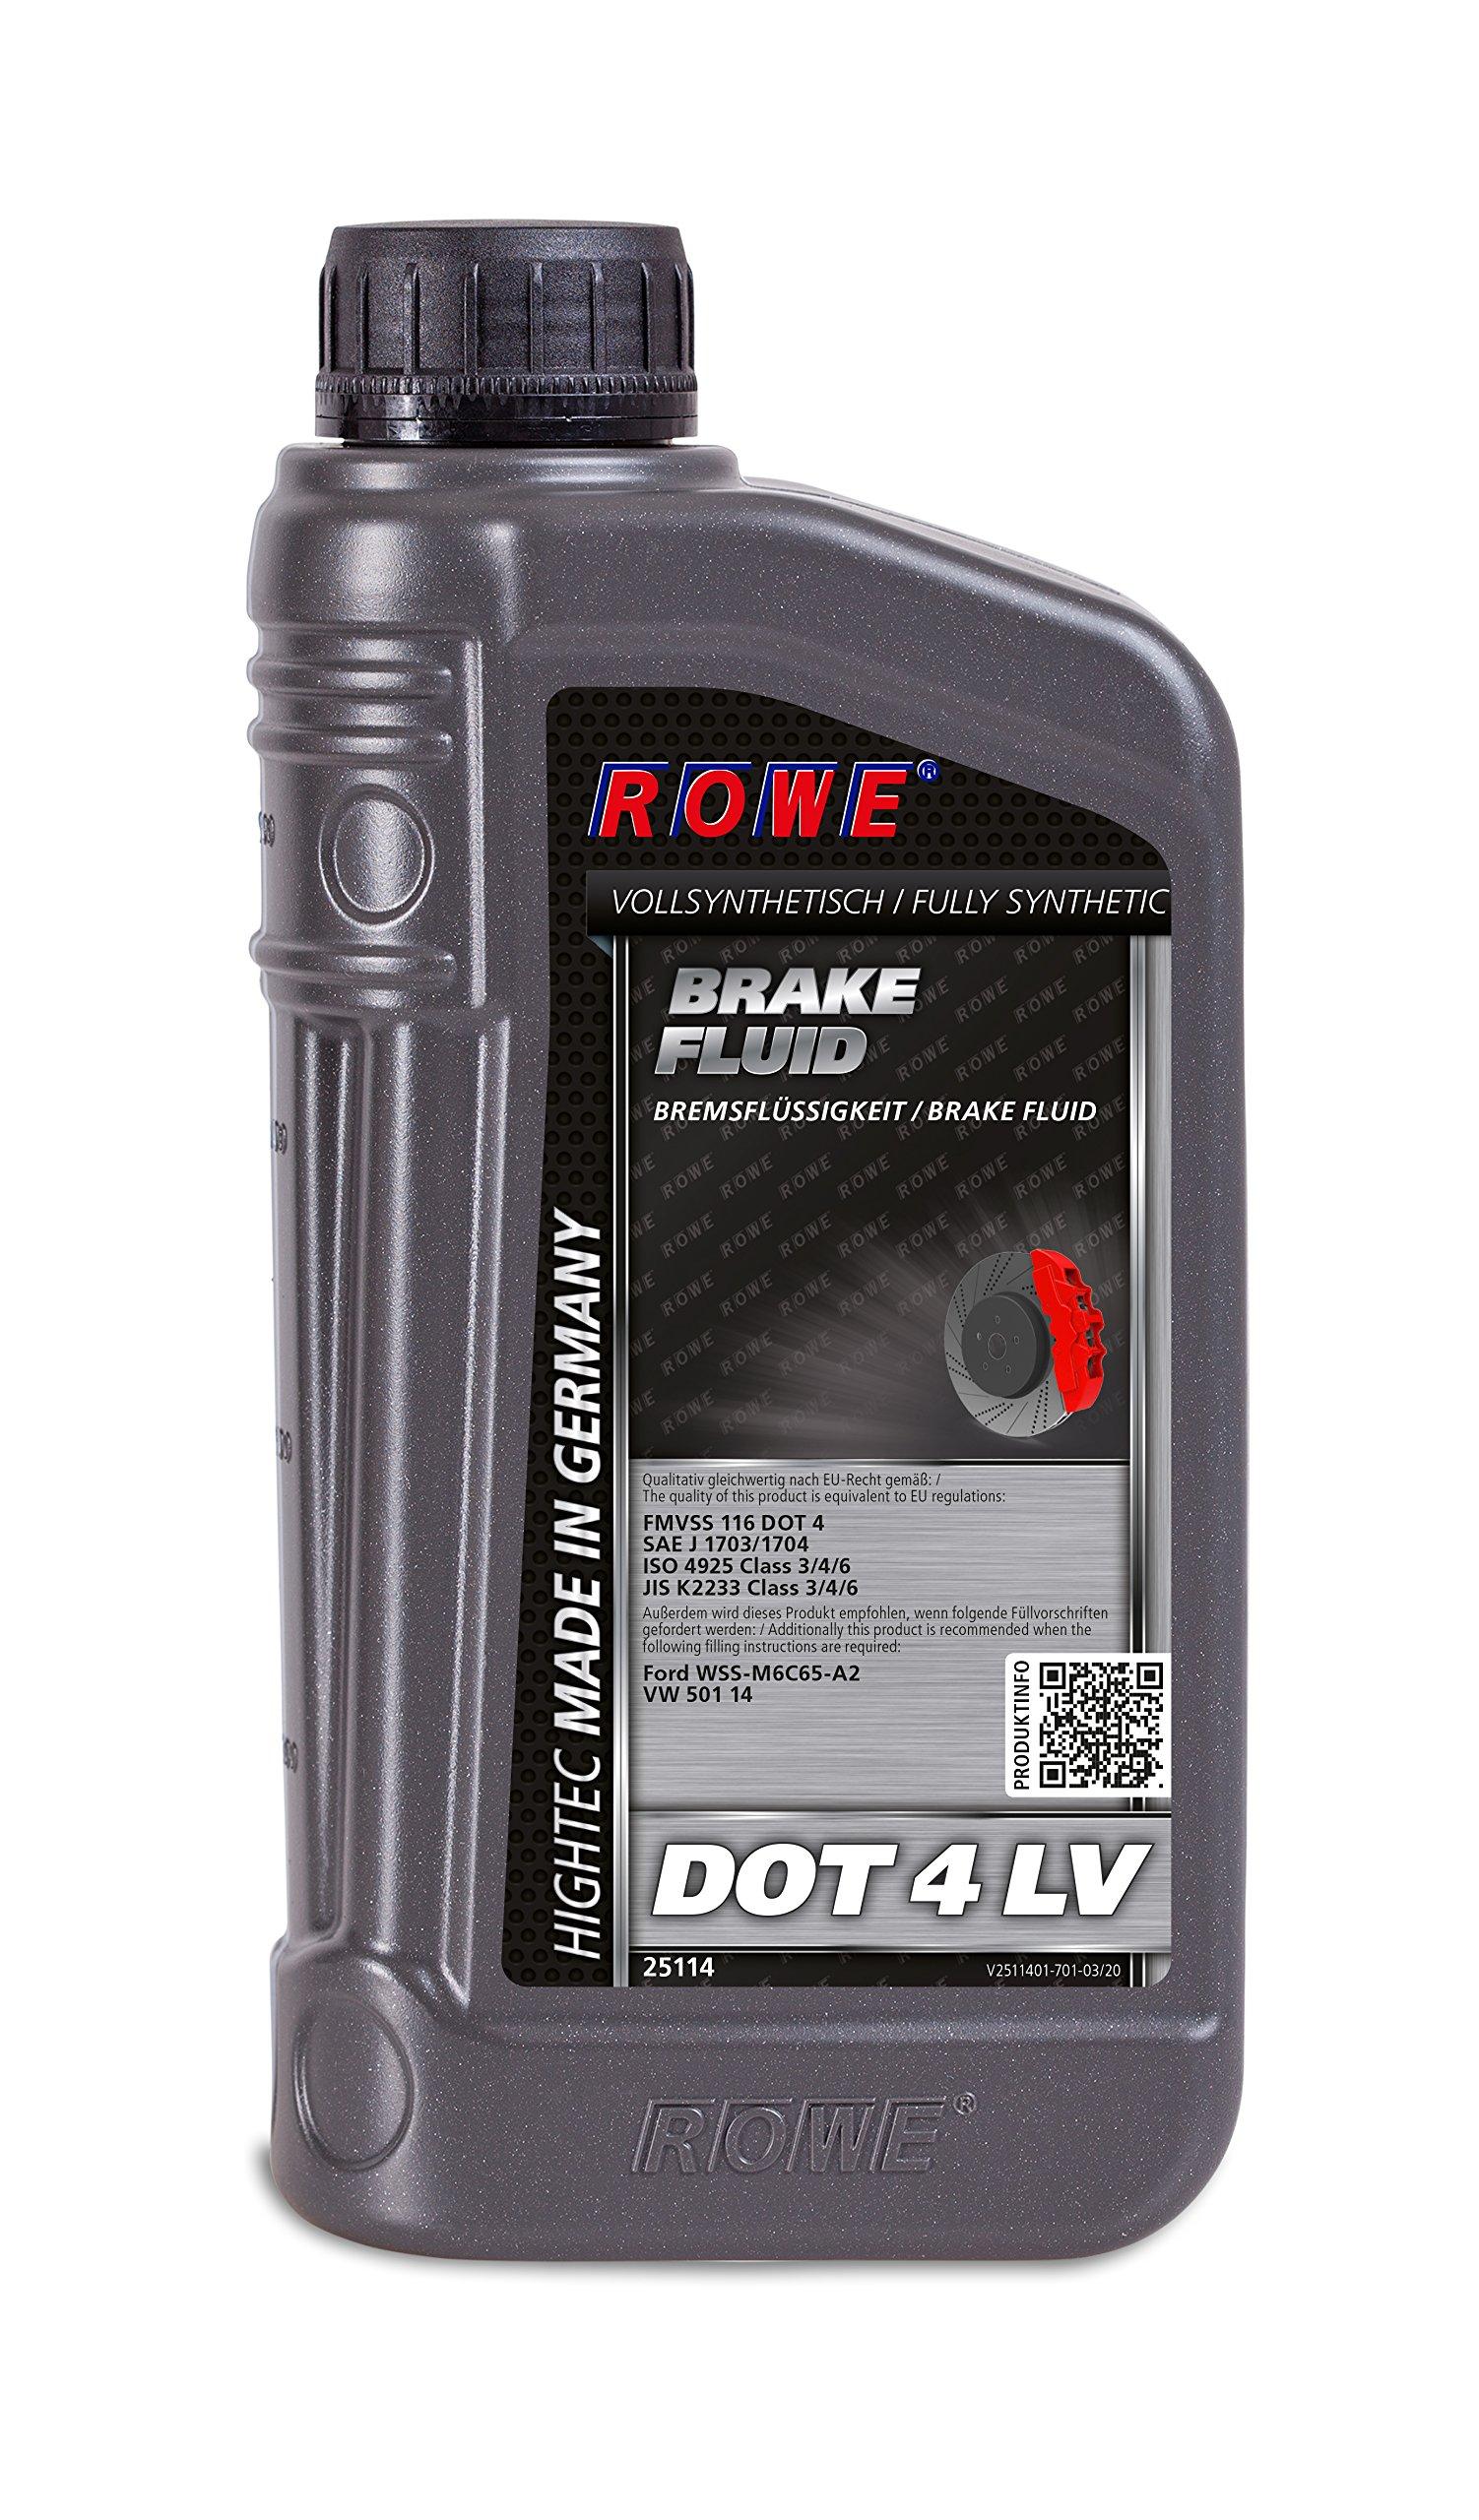 Brake Fluid Rowe 2511417103 Audi A3